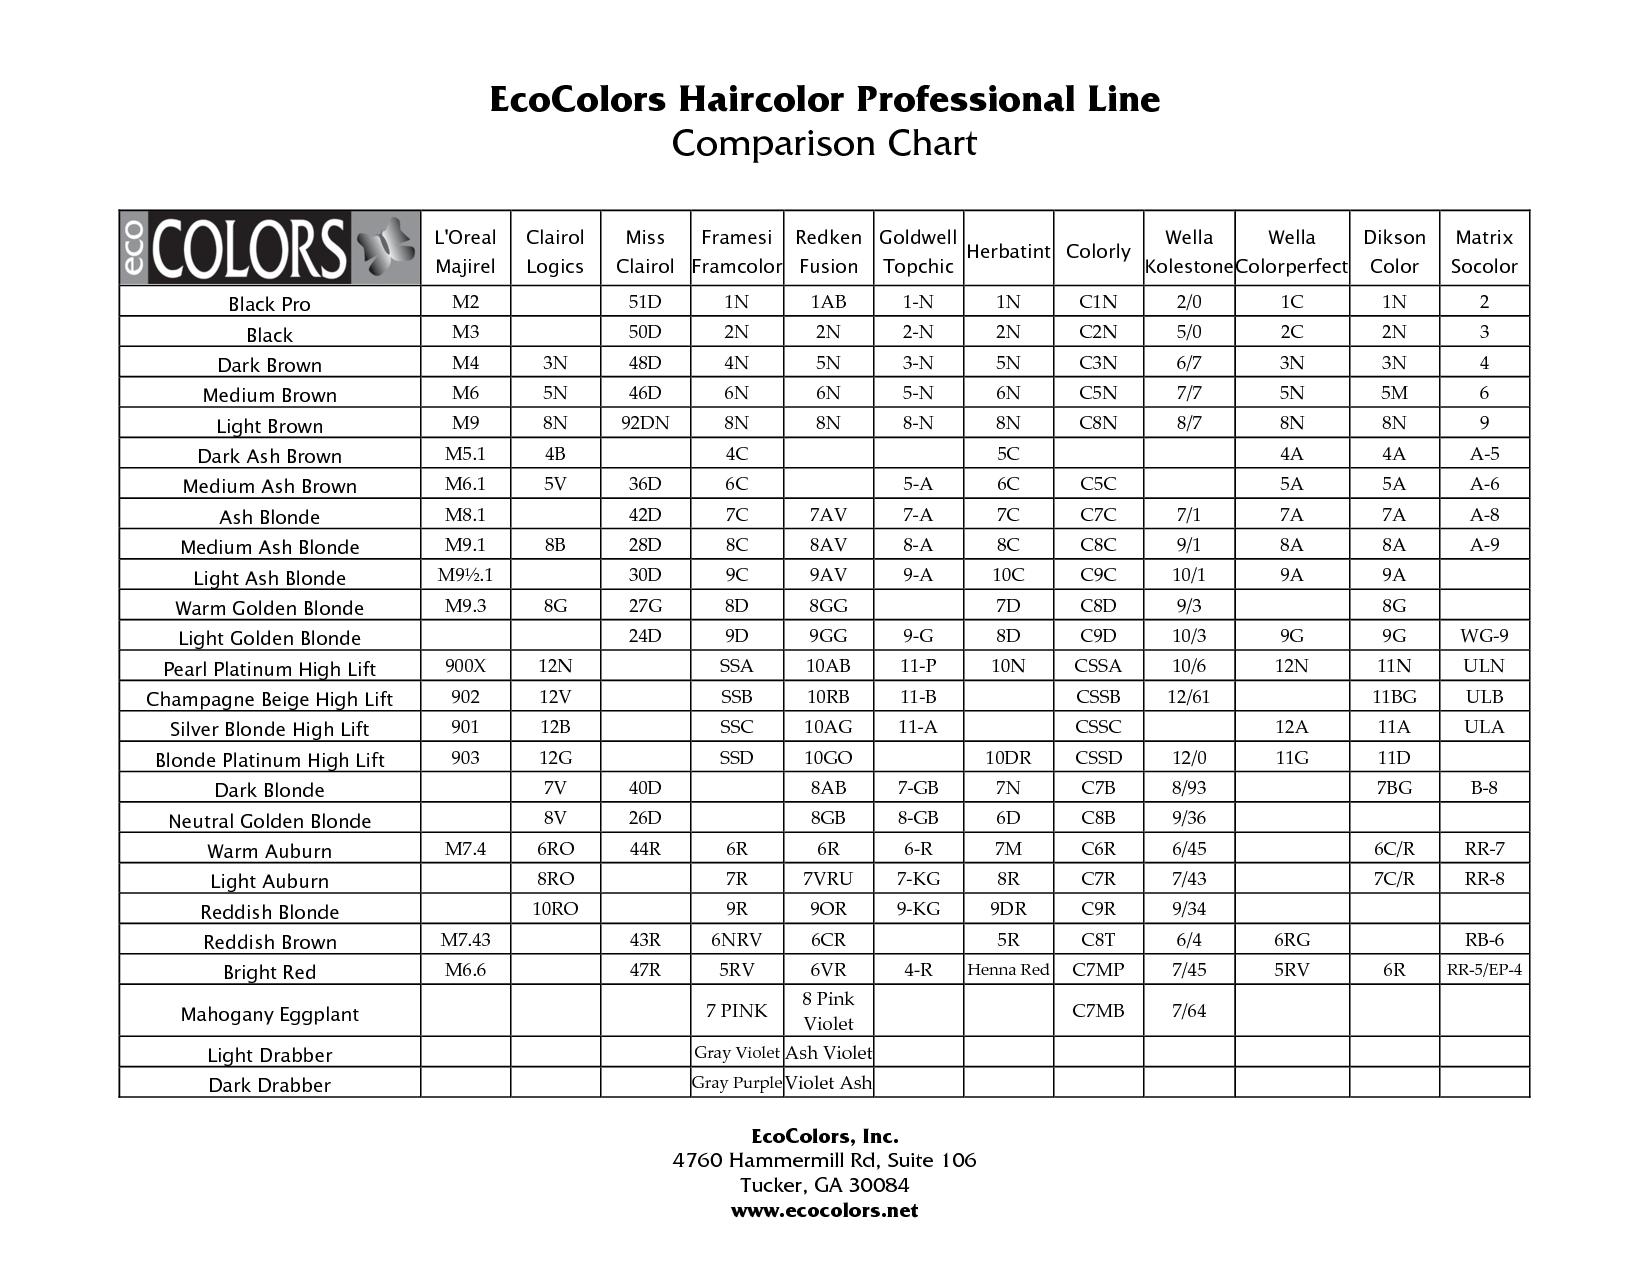 Search Results Matrix Socolor Conversion Chart Best Car Wallpaper Matrix Hair Color Chart Hair Color Redken Hair Color Chart